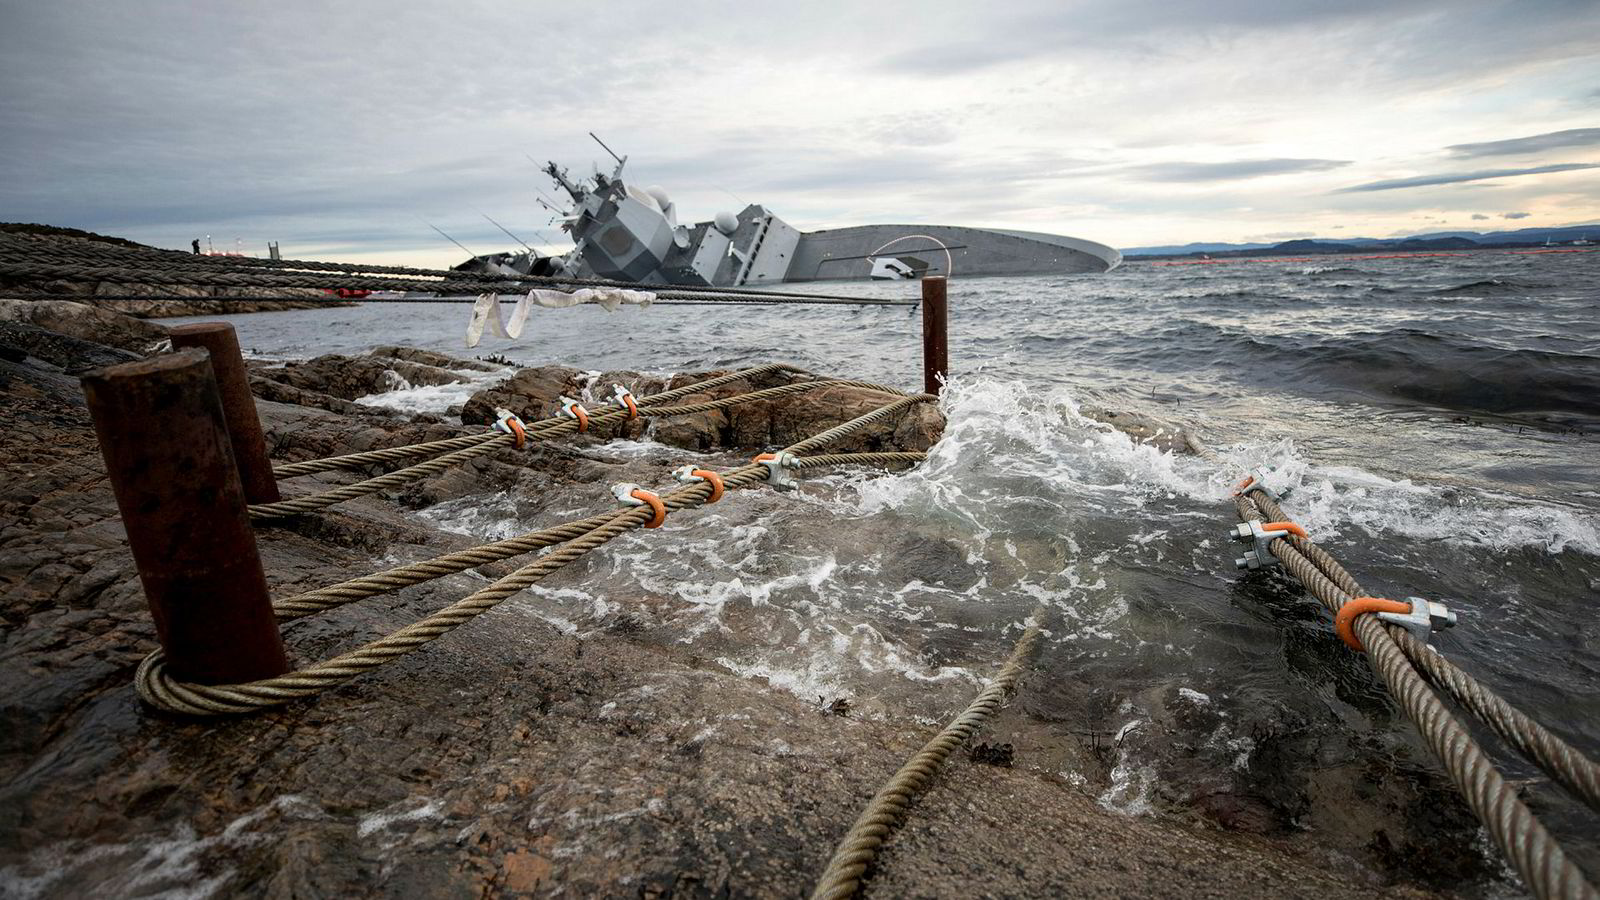 Øygarden 20181110. Det arbeides med å sikre KNM Helge Ingstad til land med vaiere. Foto: Jakob Østheim / Forsvaret / NTB scanpix